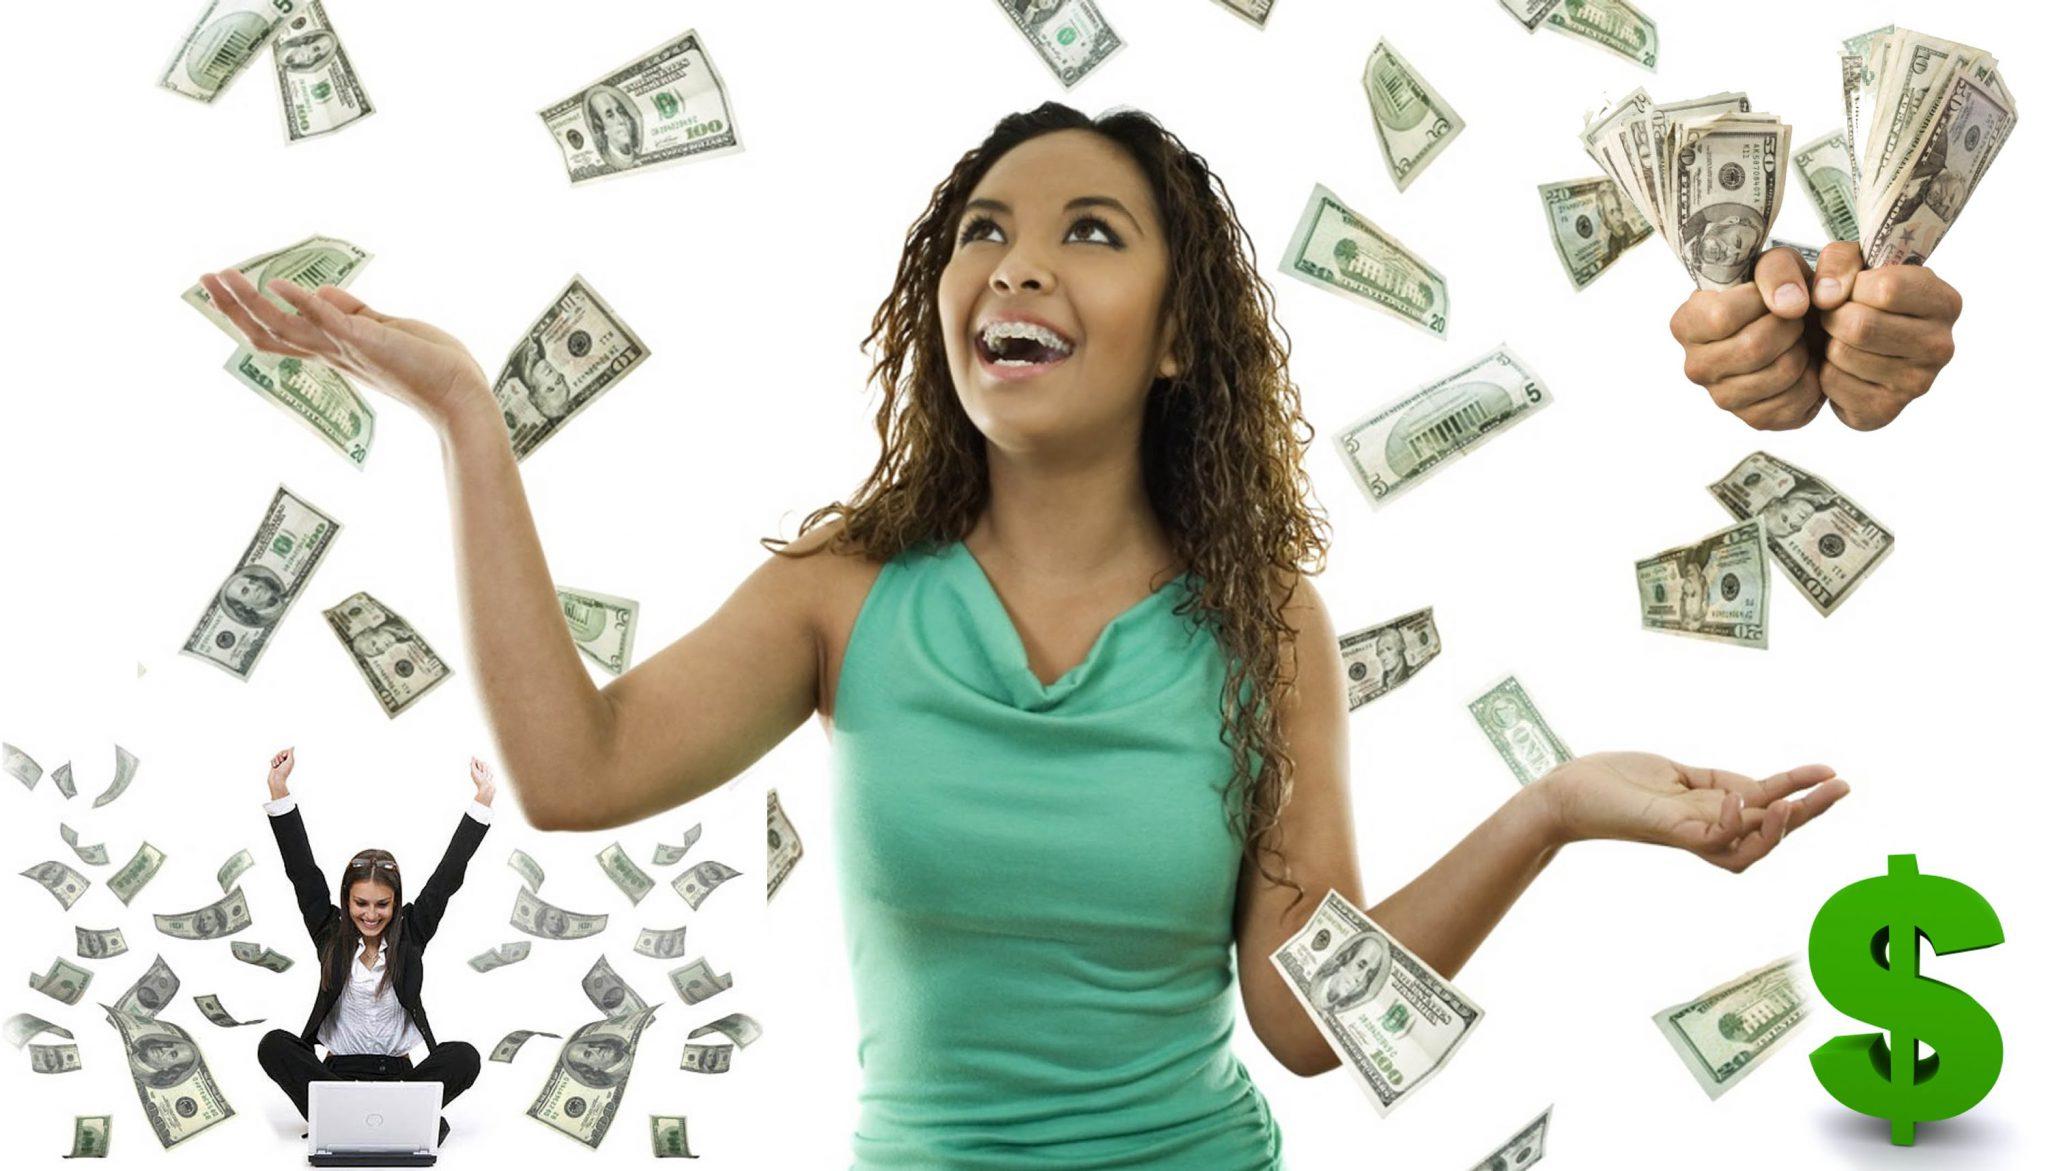 Manifesting Money and Wealth Through Meditation